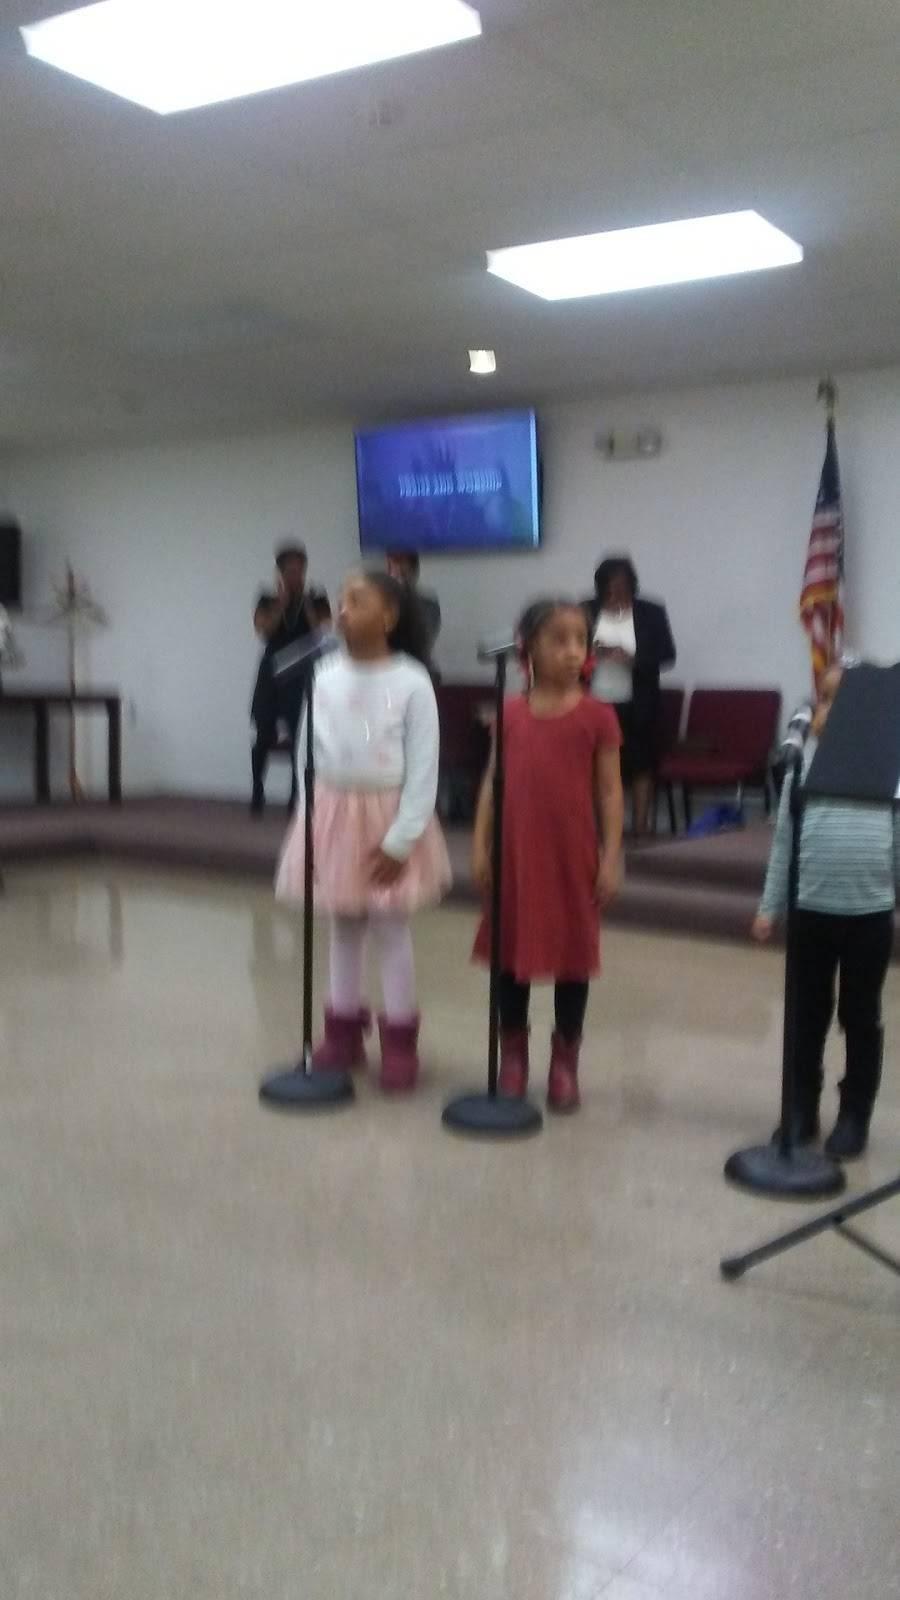 Victory Temple - church  | Photo 1 of 1 | Address: 2762 Duke St, Alexandria, VA 22314, USA | Phone: (703) 370-2233